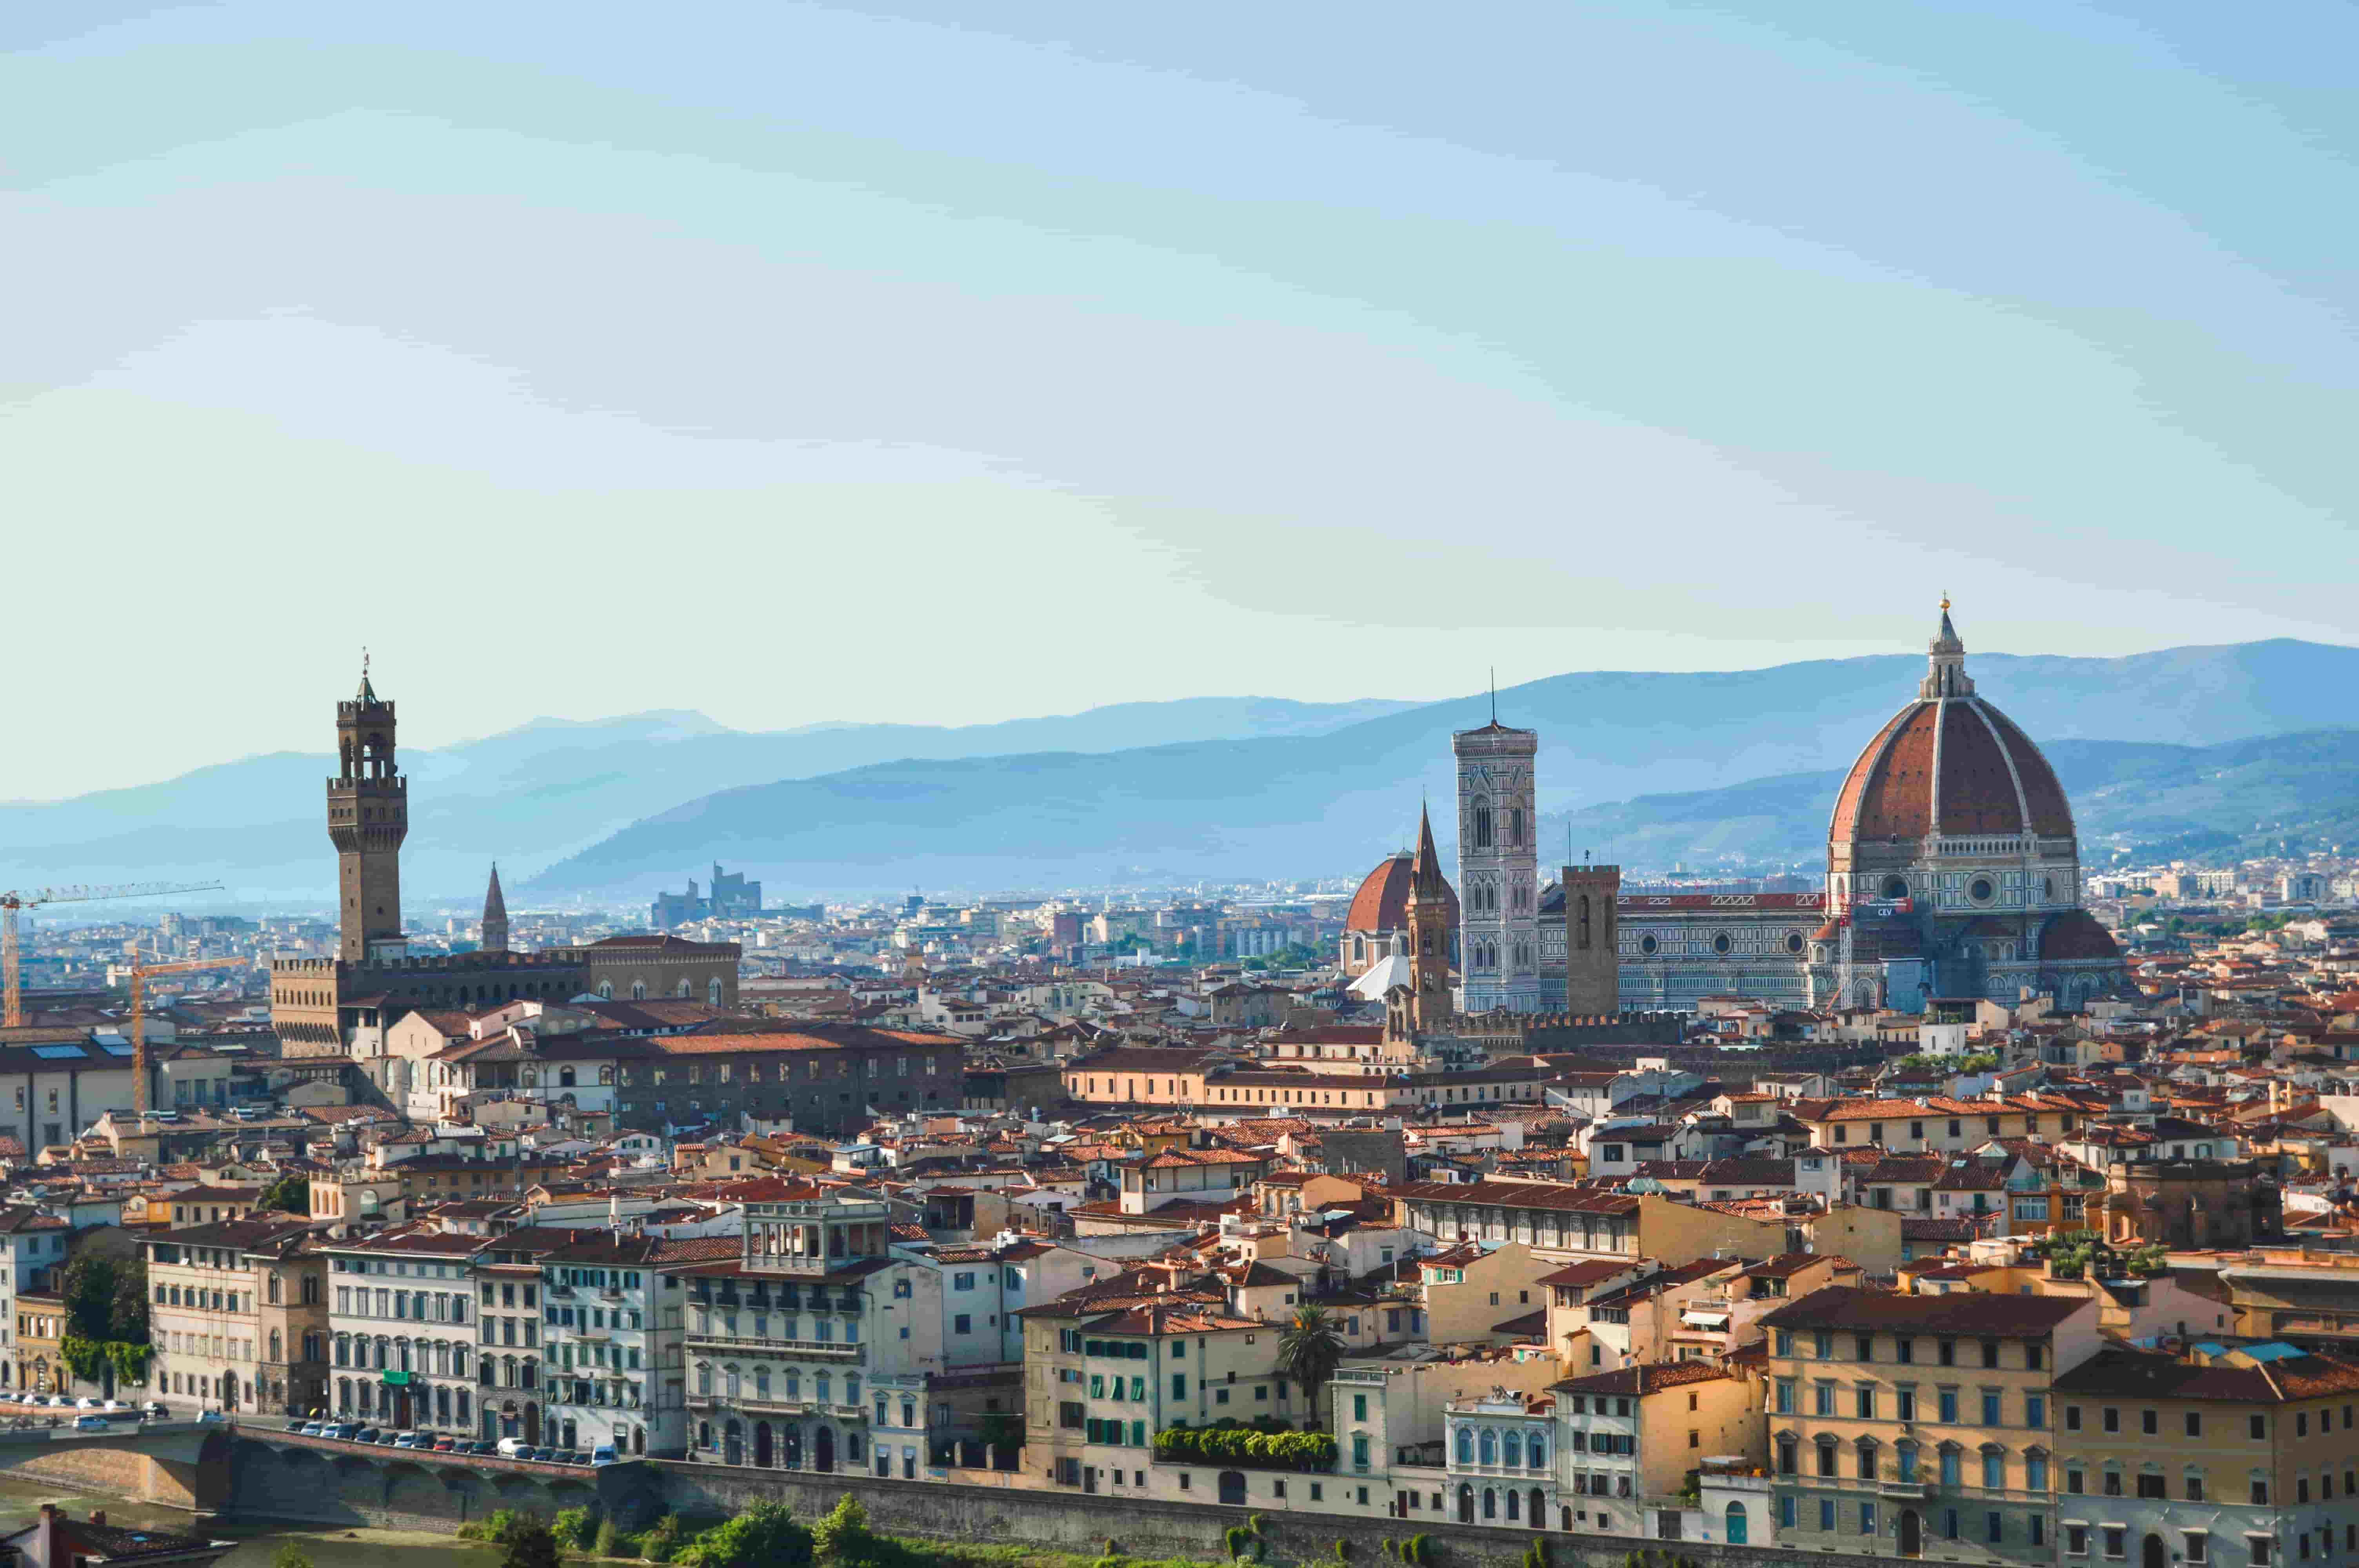 Florencia: norte de italia